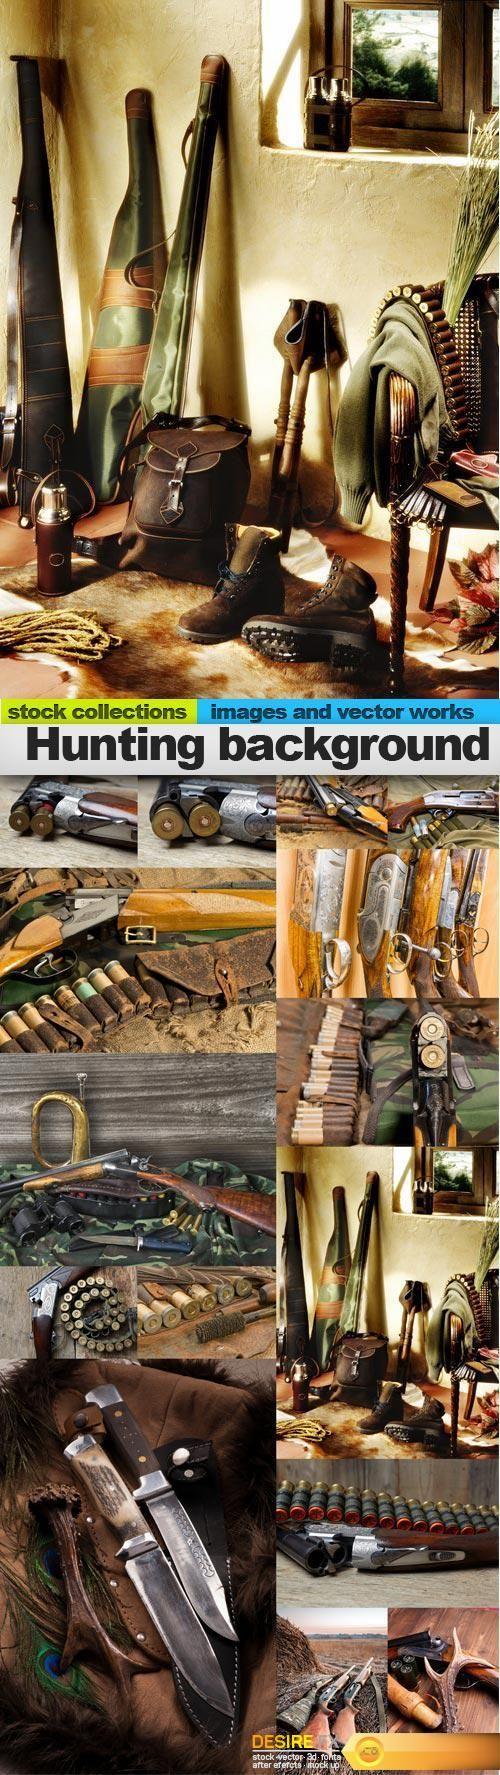 Hunting background, 15 x UHQ JPEG  http://www.desirefx.me/hunting-background-15-x-uhq-jpeg/